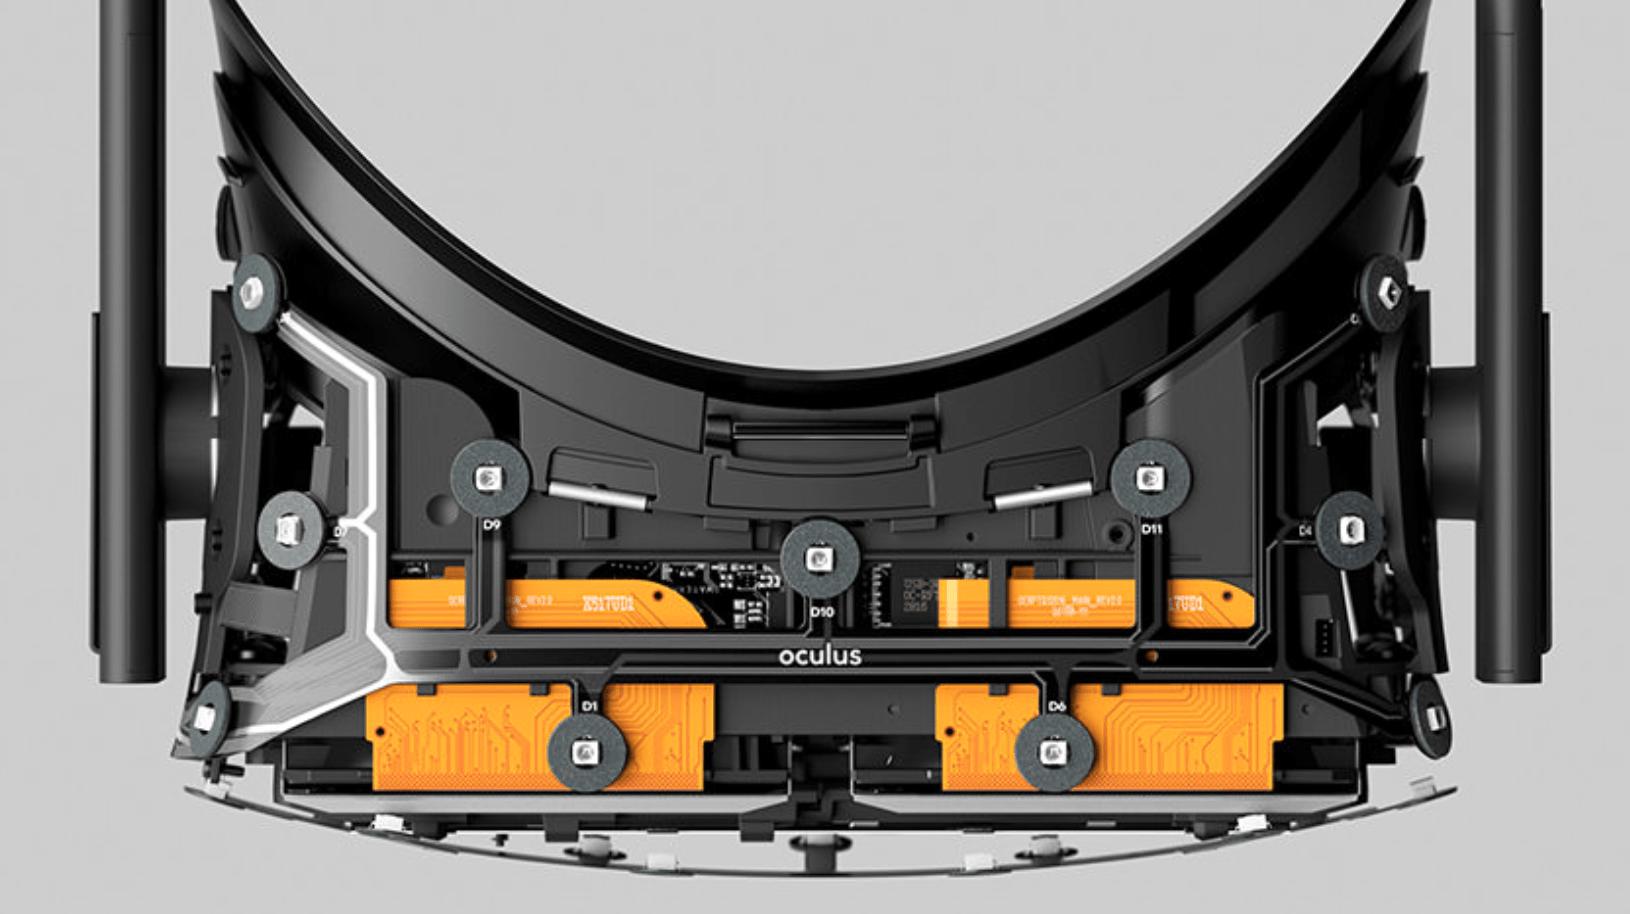 Oculus Reveals Its Rift VR Headset